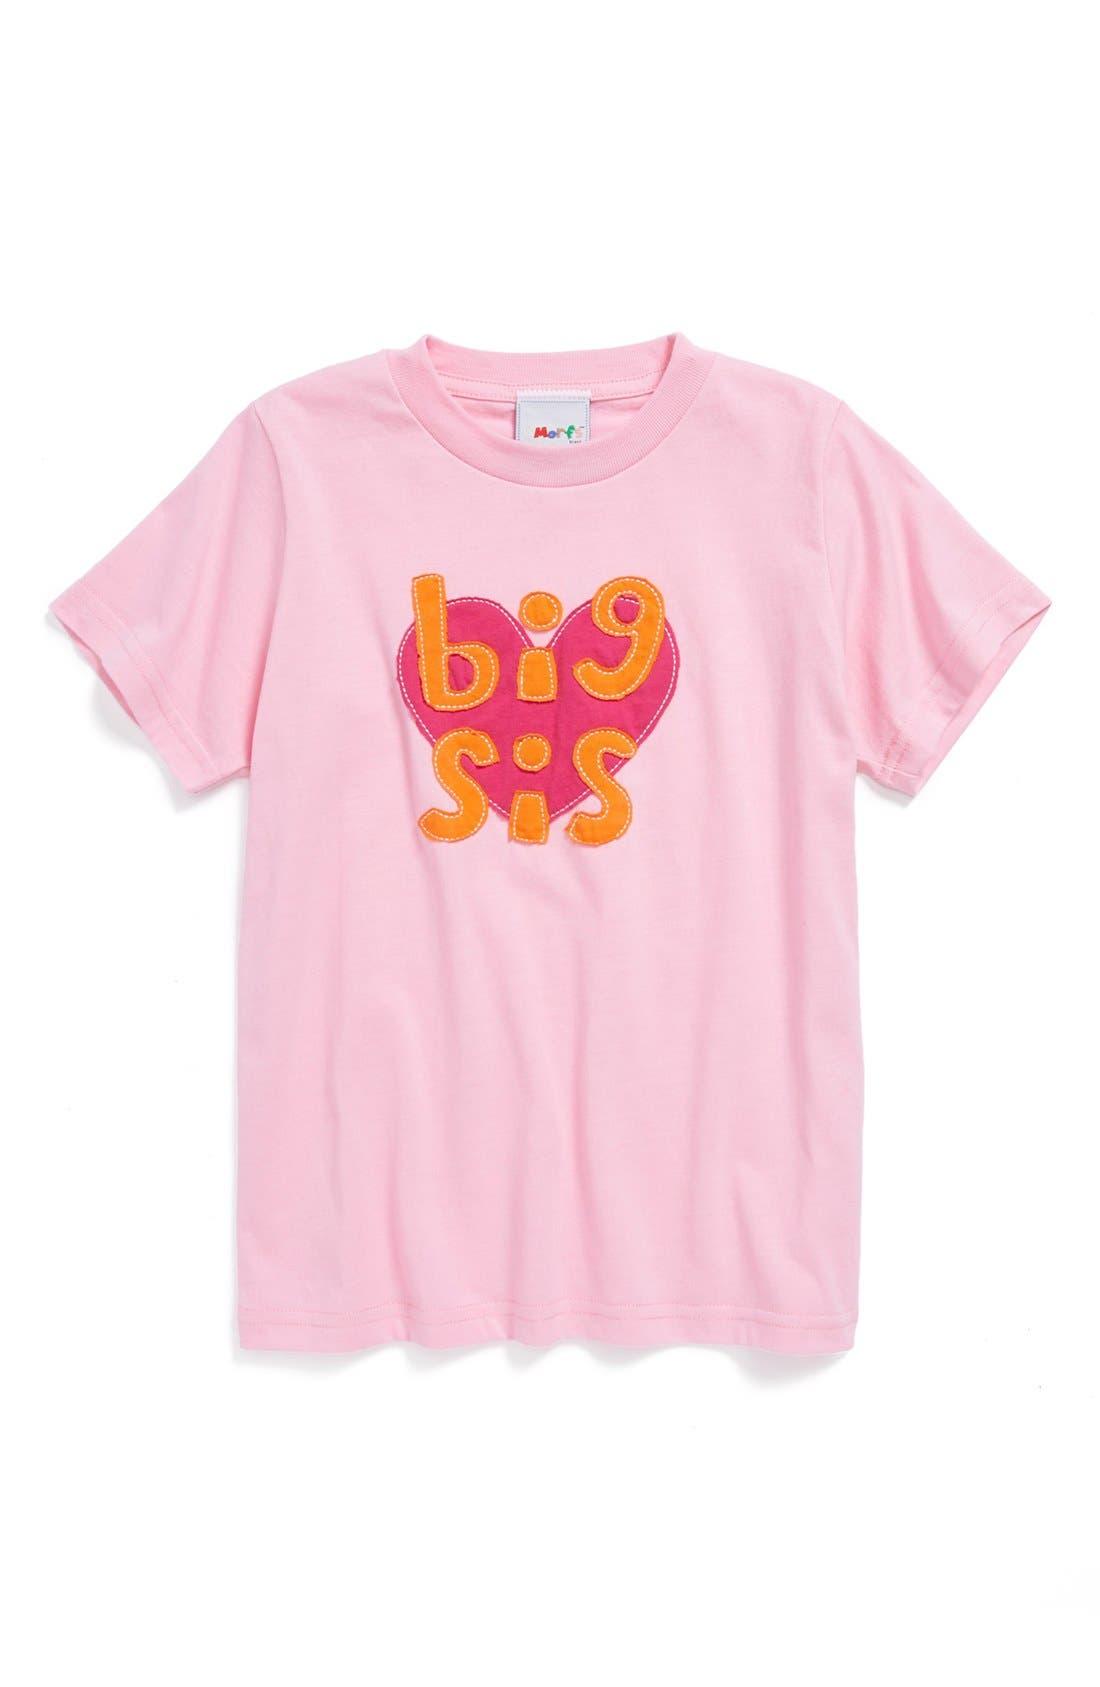 Alternate Image 1 Selected - Morfs 'Big Sis' Short Sleeve Tee (Little Girls & Big Girls)